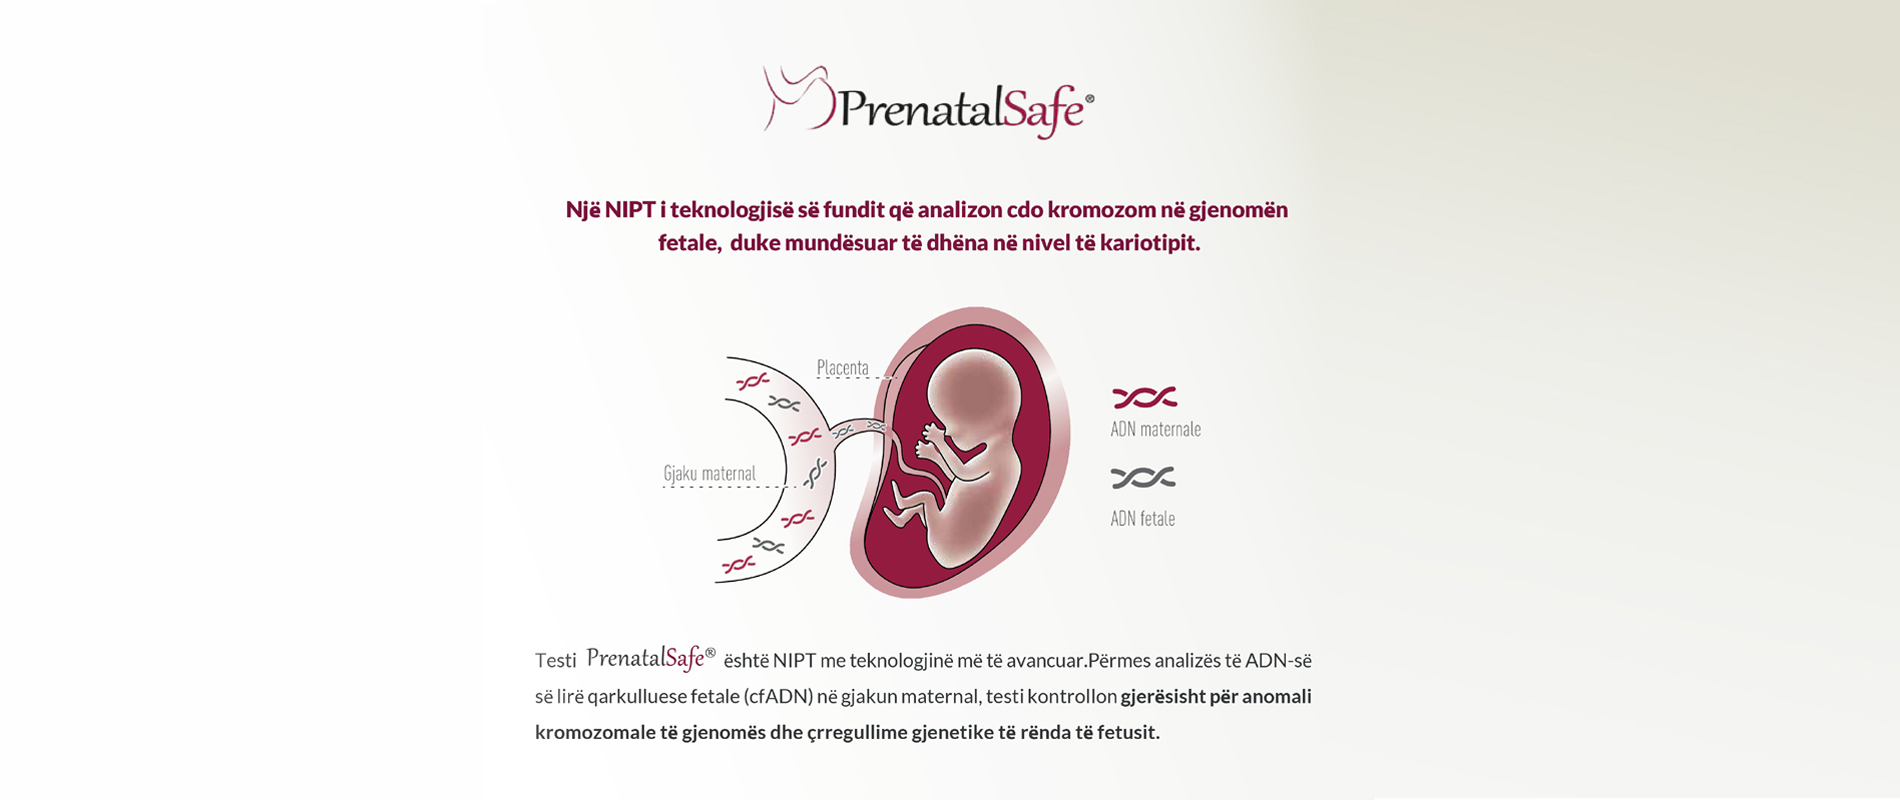 Teste Gjenetike Tirane, Analiza Gjenetike Tirane, Ekzaminime per Infertilitetin, Test NIPT, Kontroll Jo Invaziv Prenatal, Test Prenatal - StemGen Partners